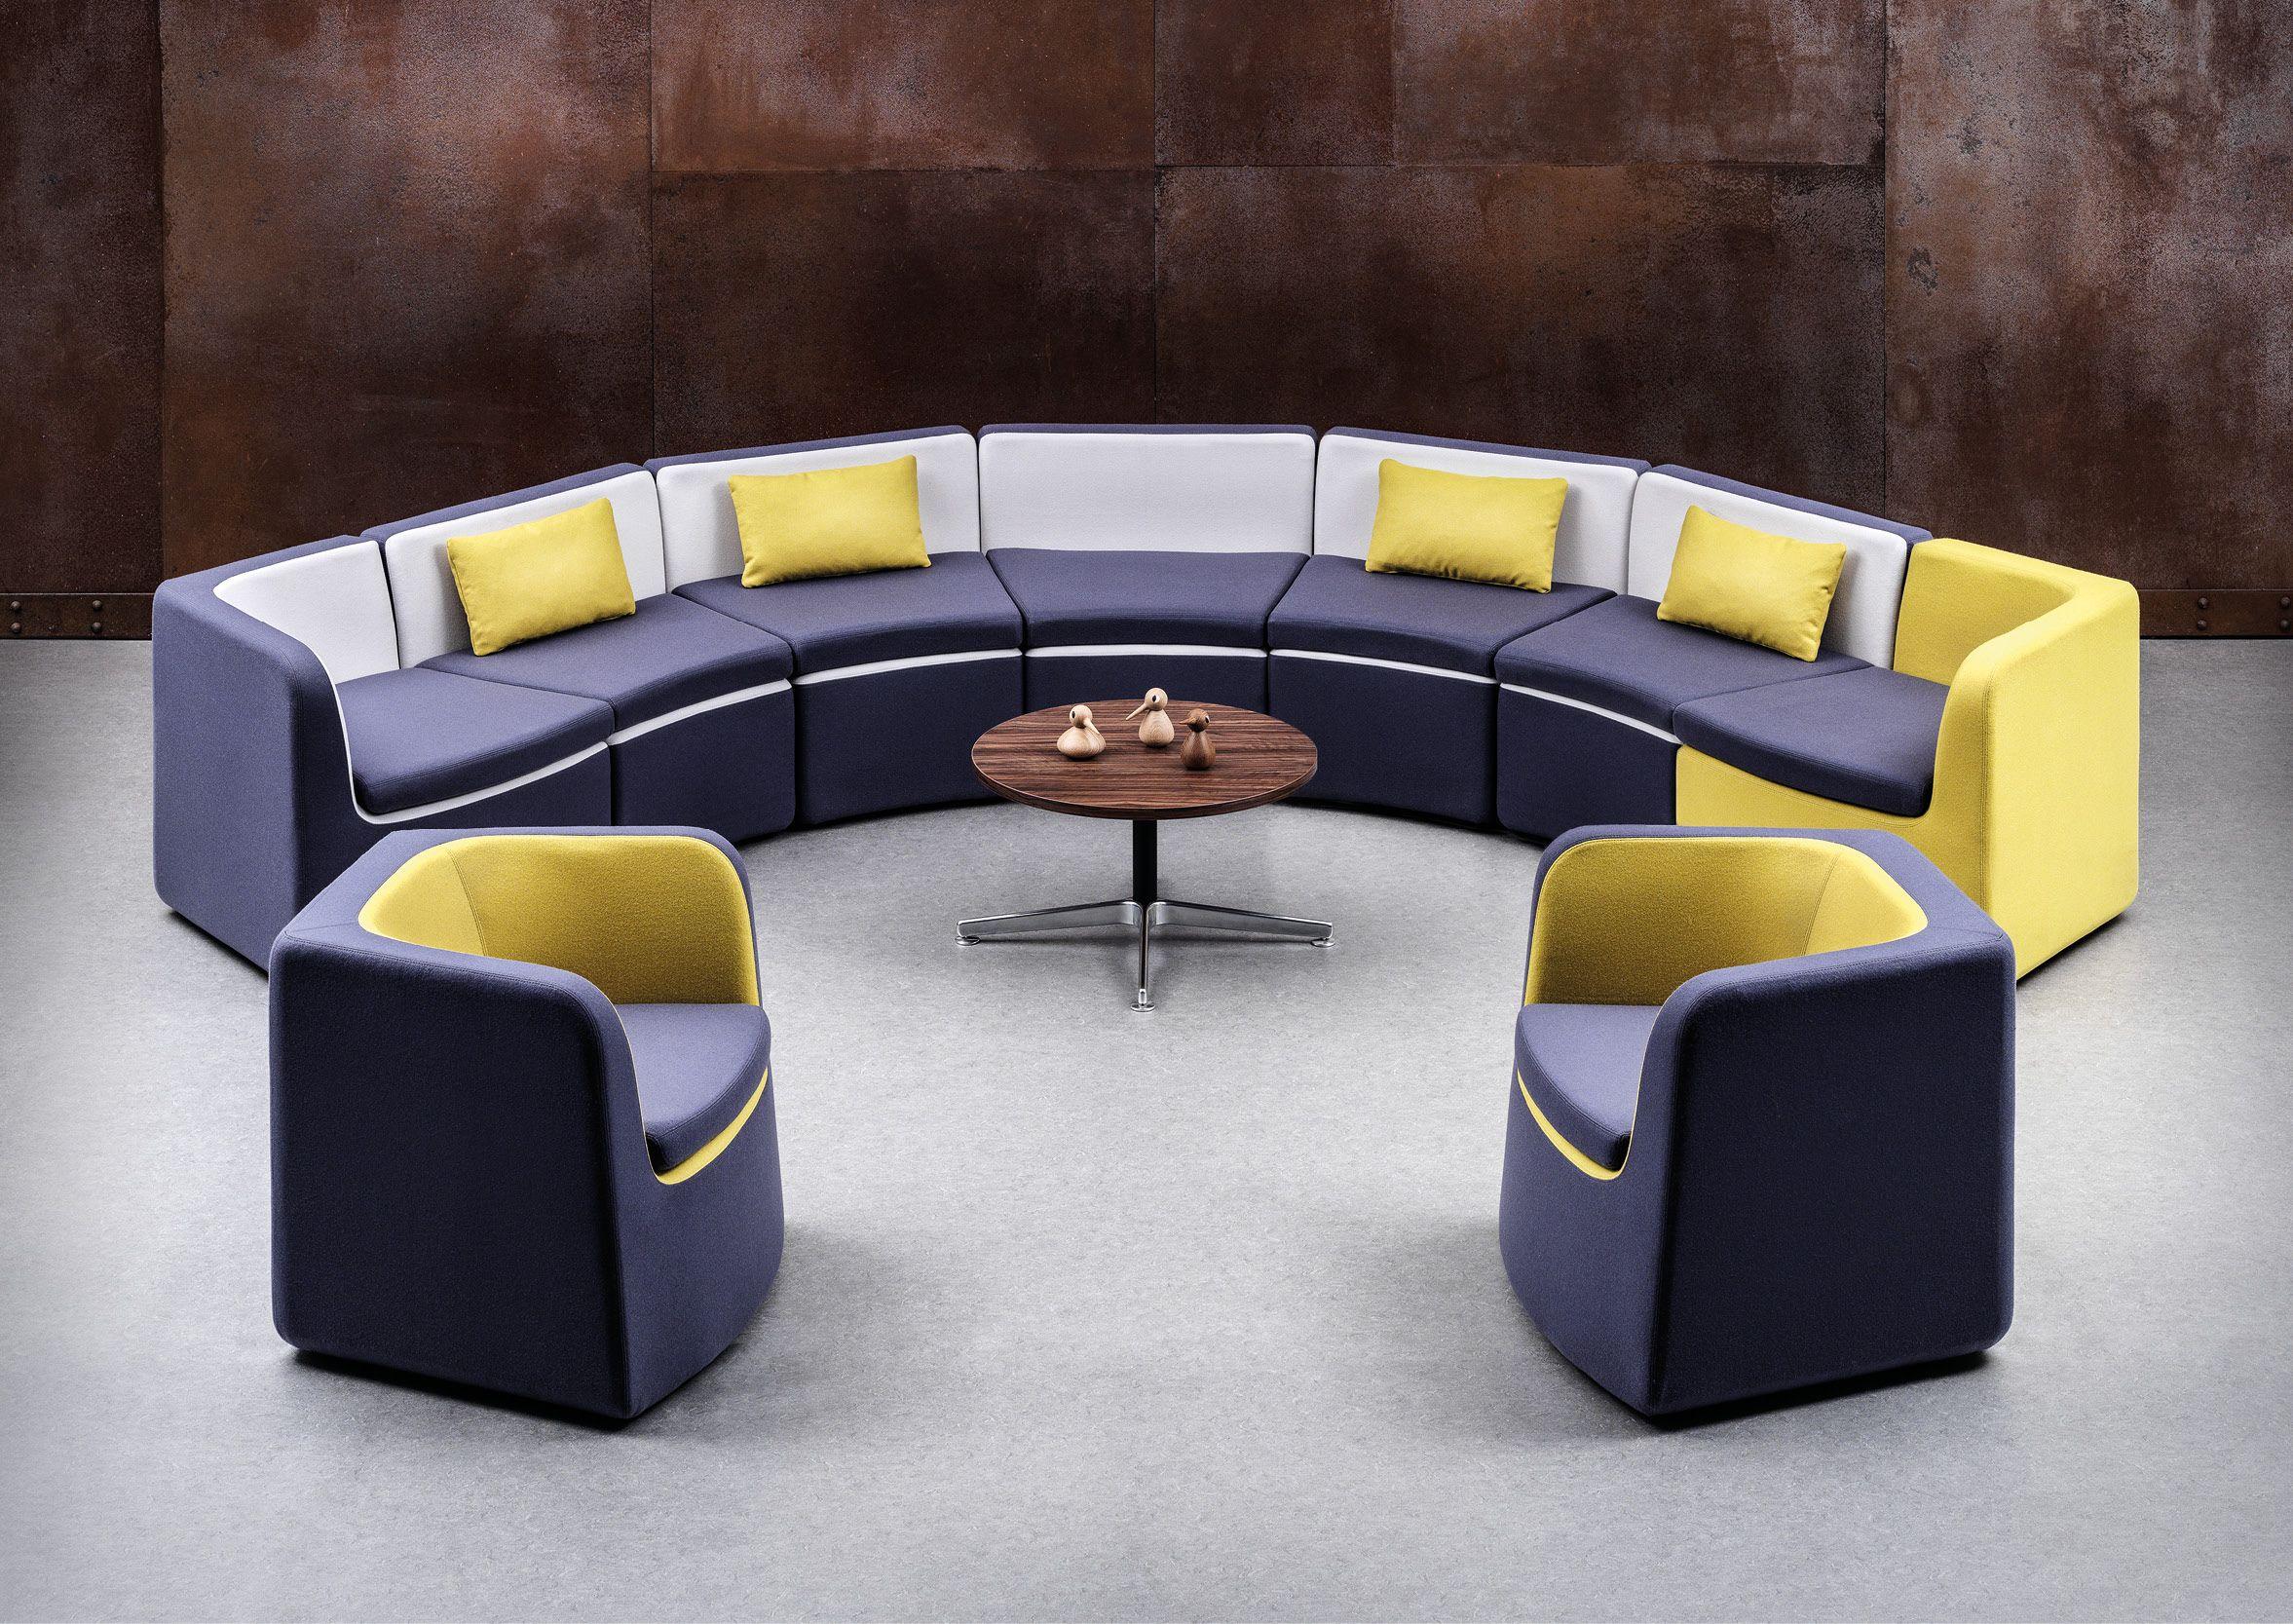 Venus Haven Bench and Haven Media Sofa by Allermuir